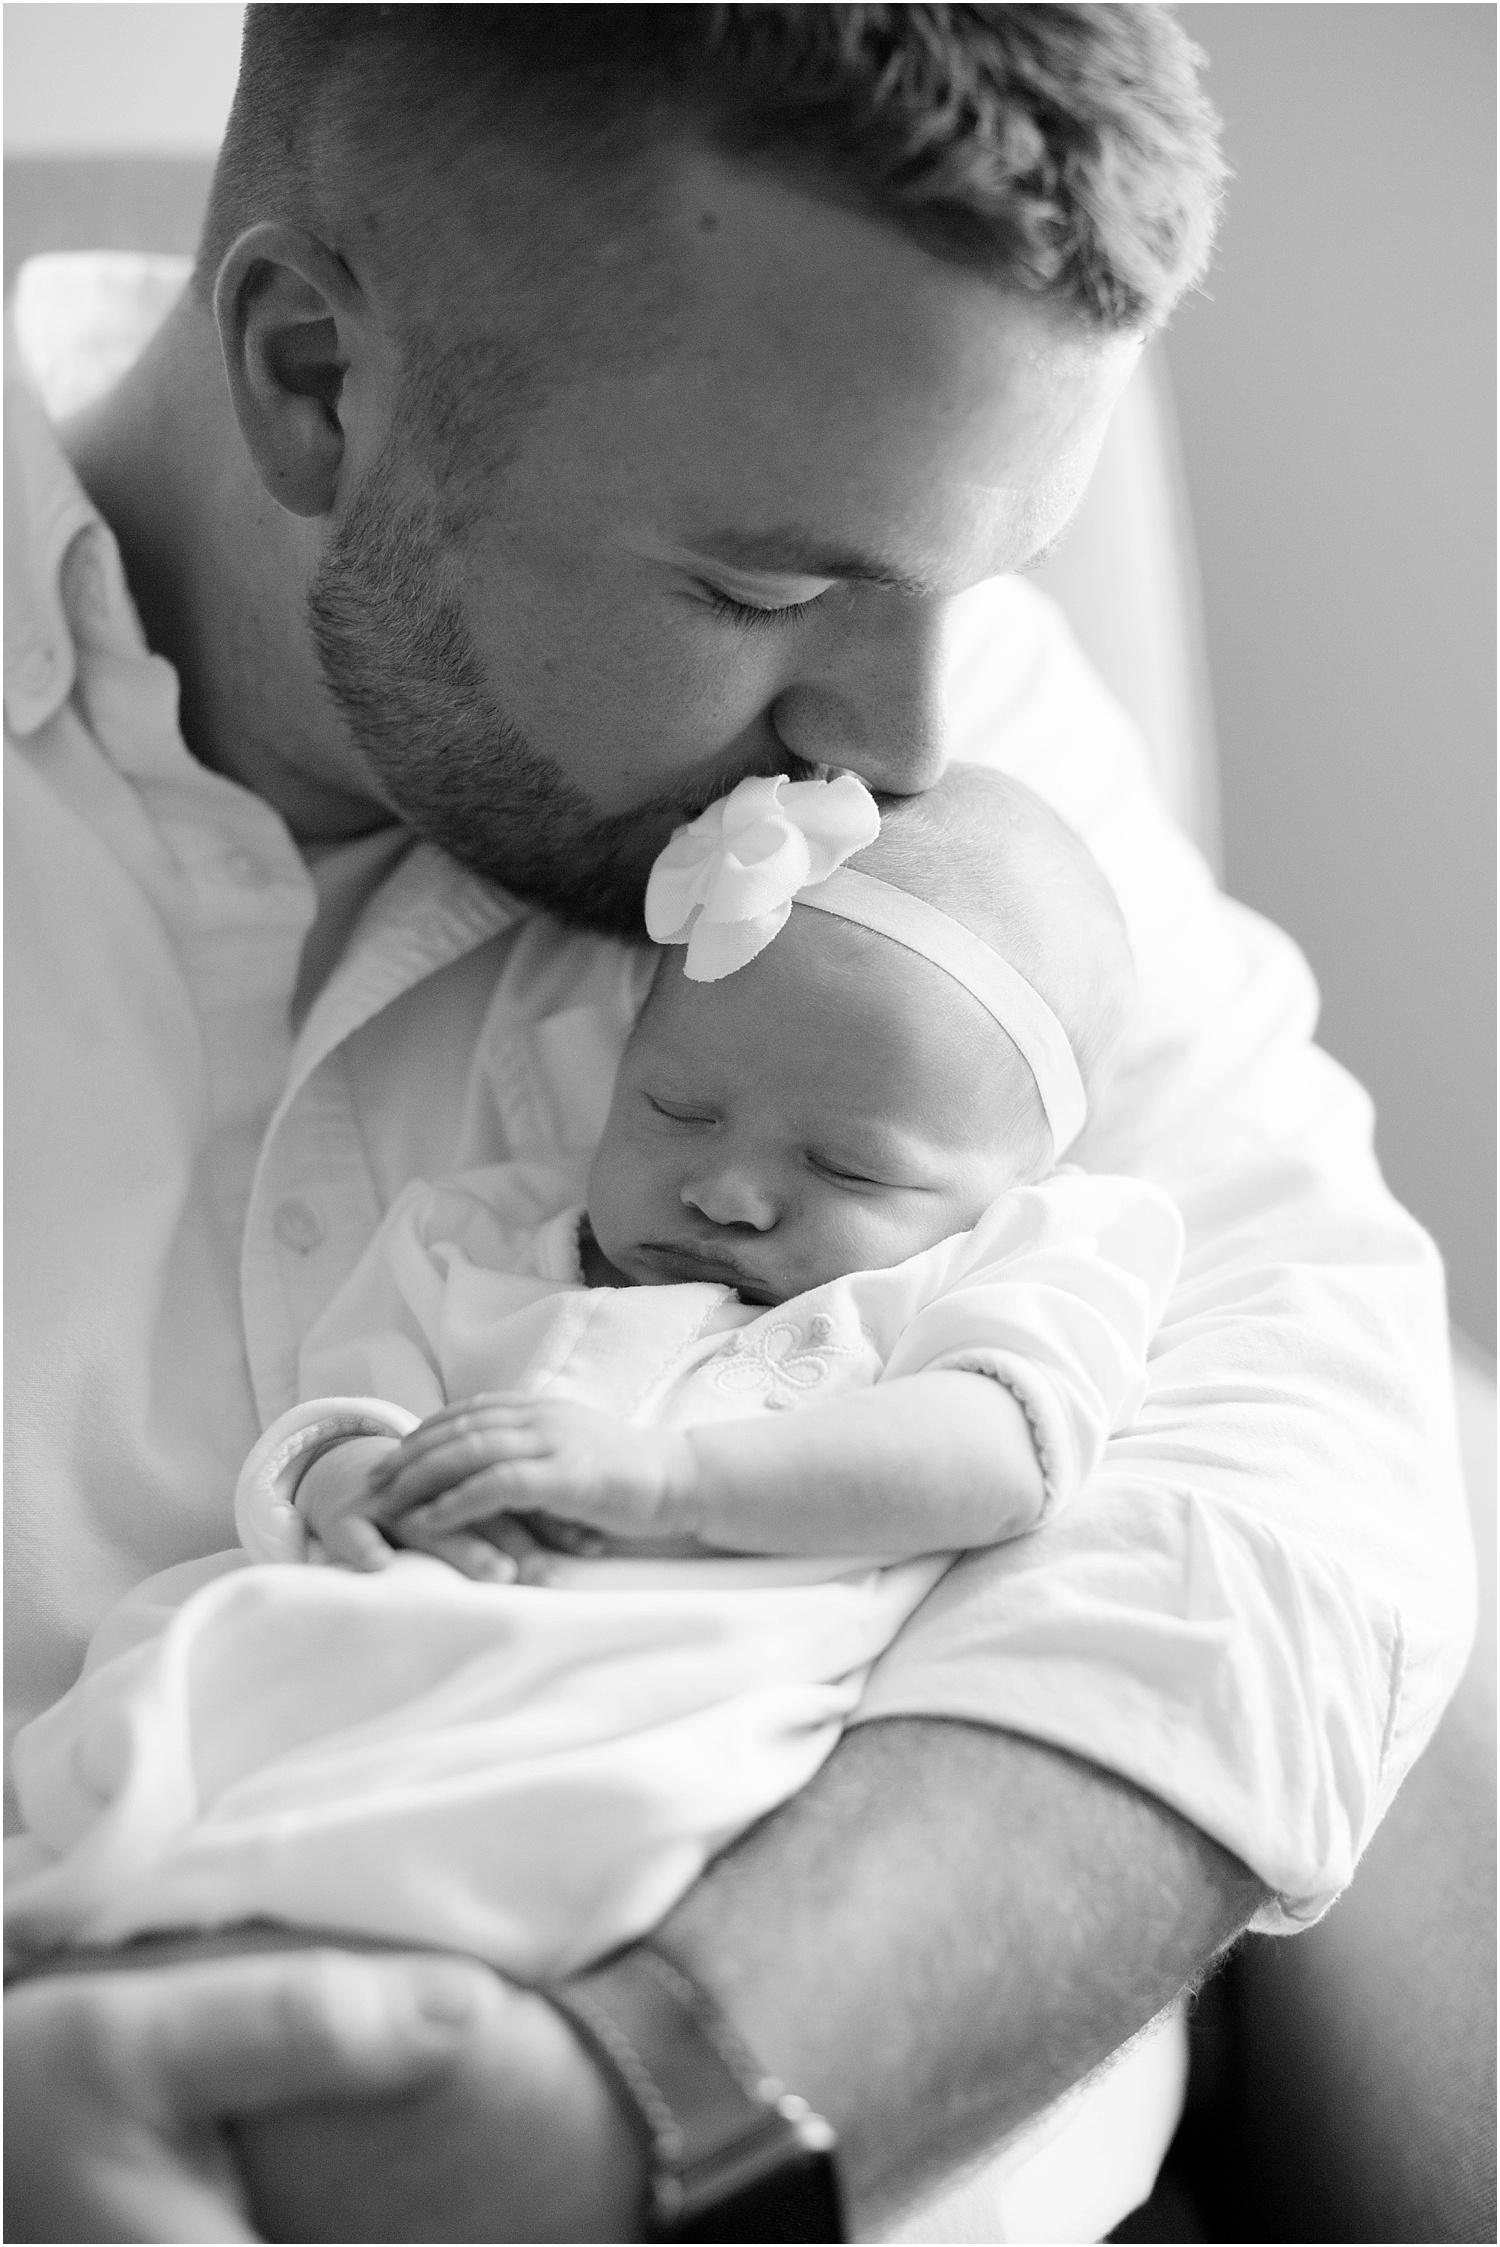 Newborn Session | Ashley Powell Photography | Roanoke, VA Photographer